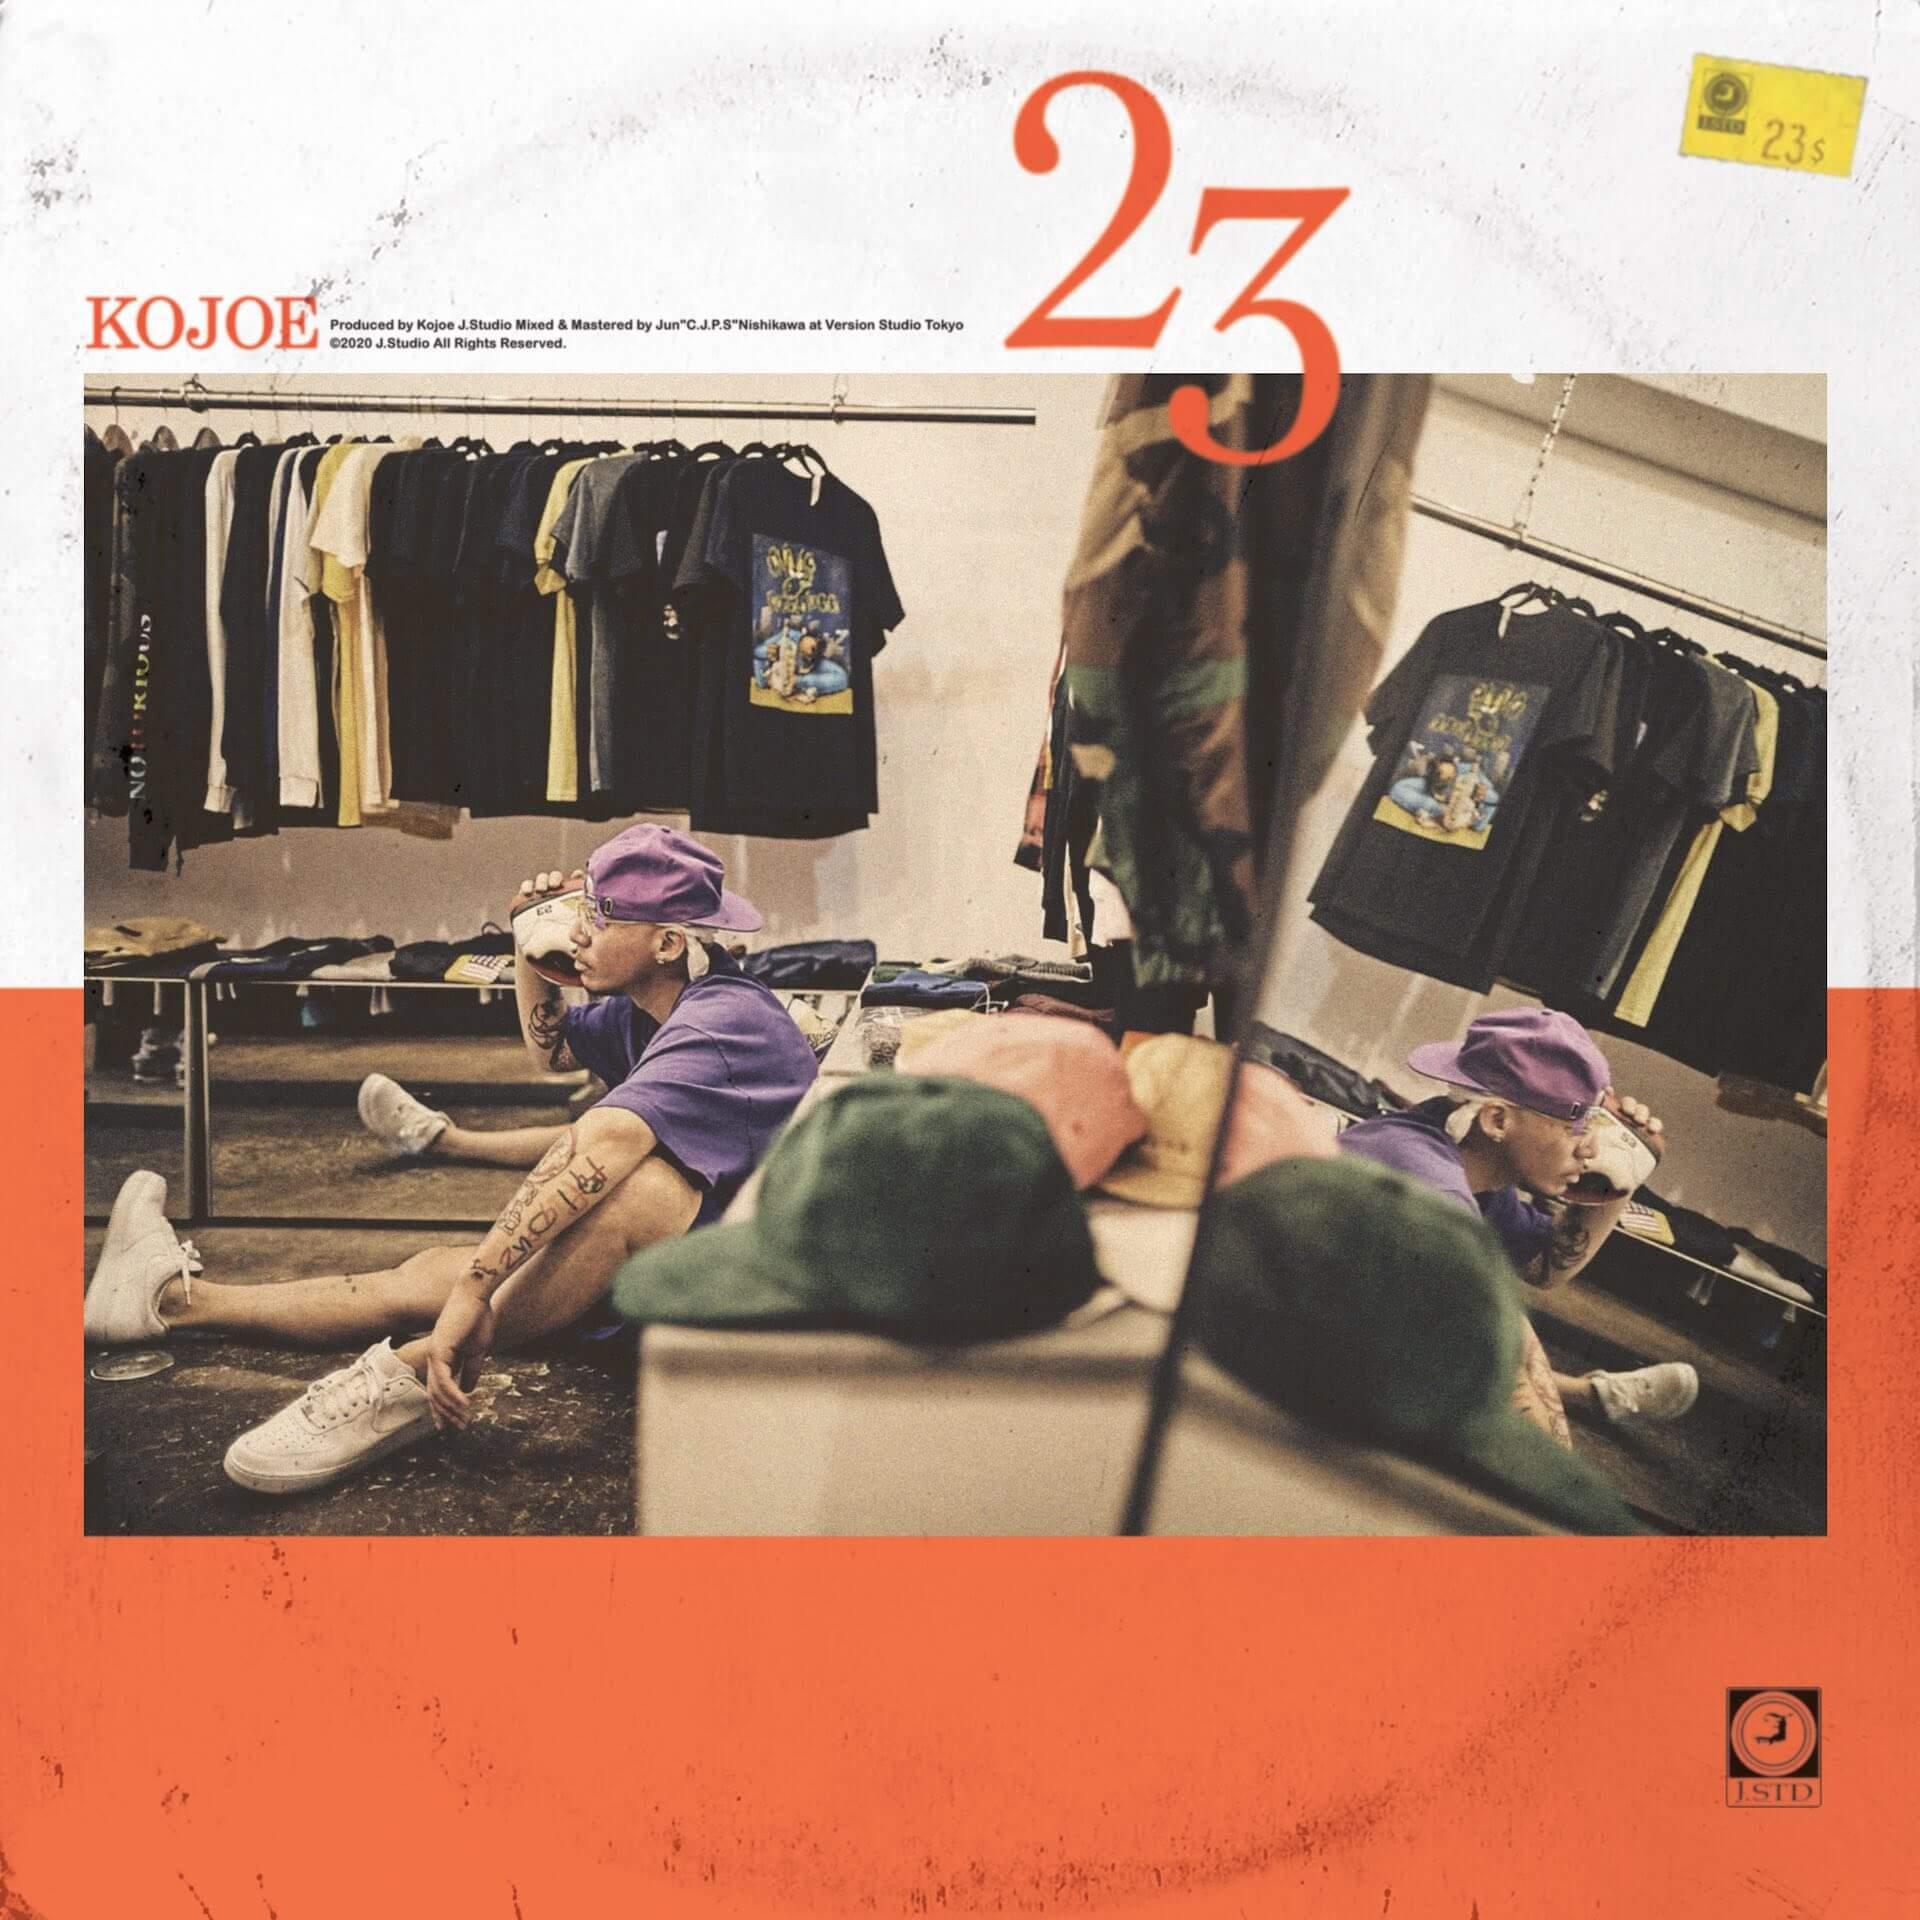 KOJOEが最新EP『23』より表題曲を先行リリース&MV公開!EP・バイナルの予約も受付中 music200727_kojoe_mv_02